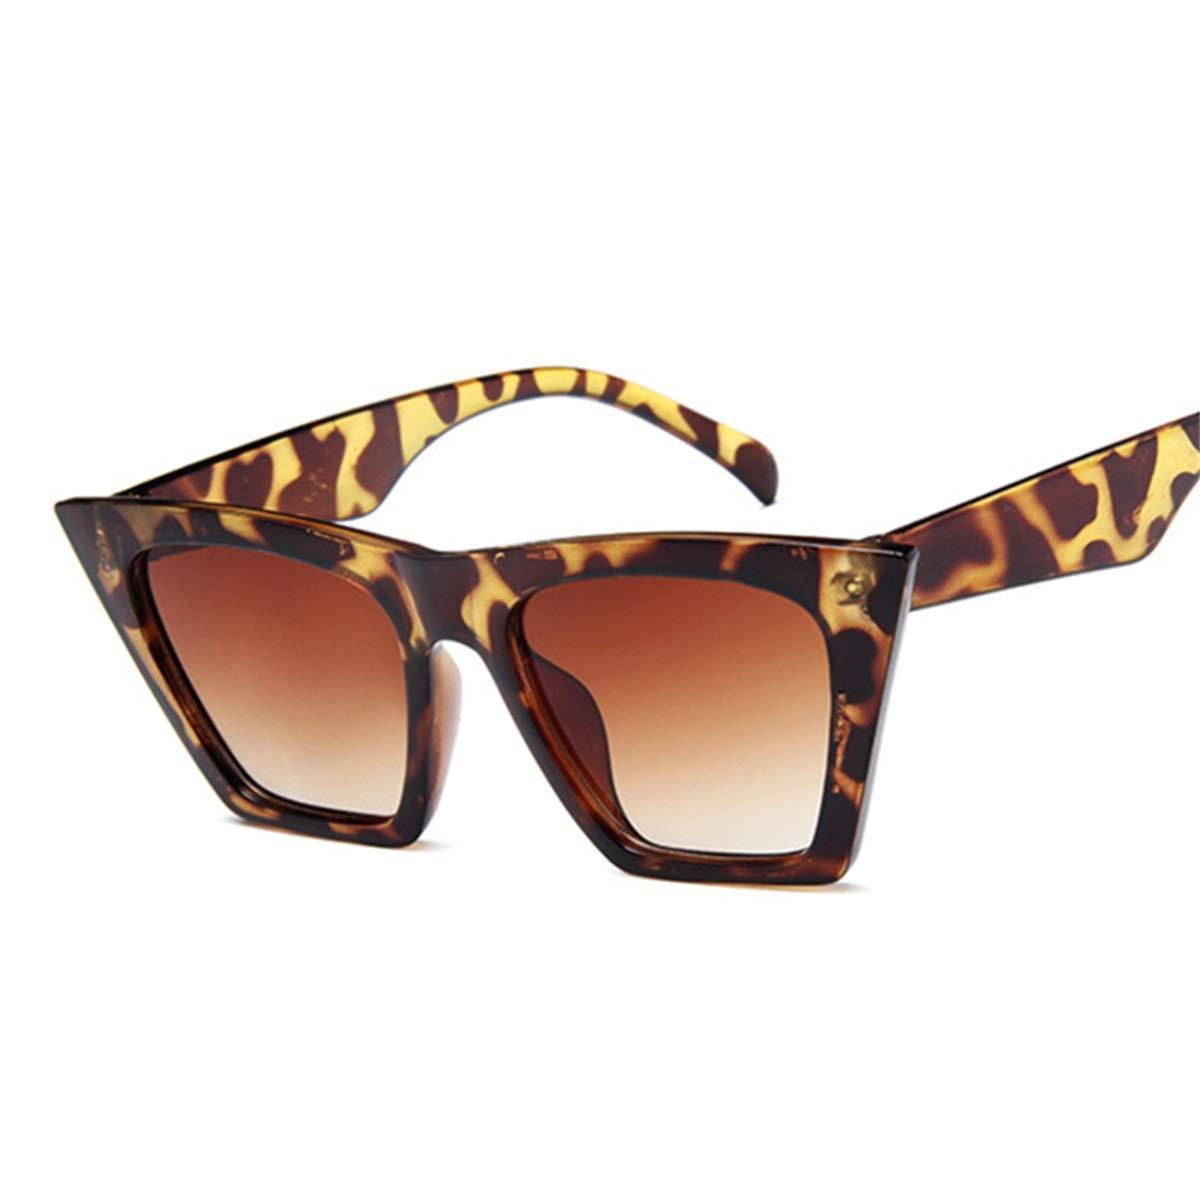 Female Vintage Sunglasses Women//Men Fashion Cat EyeSun Glasses Classic Lady